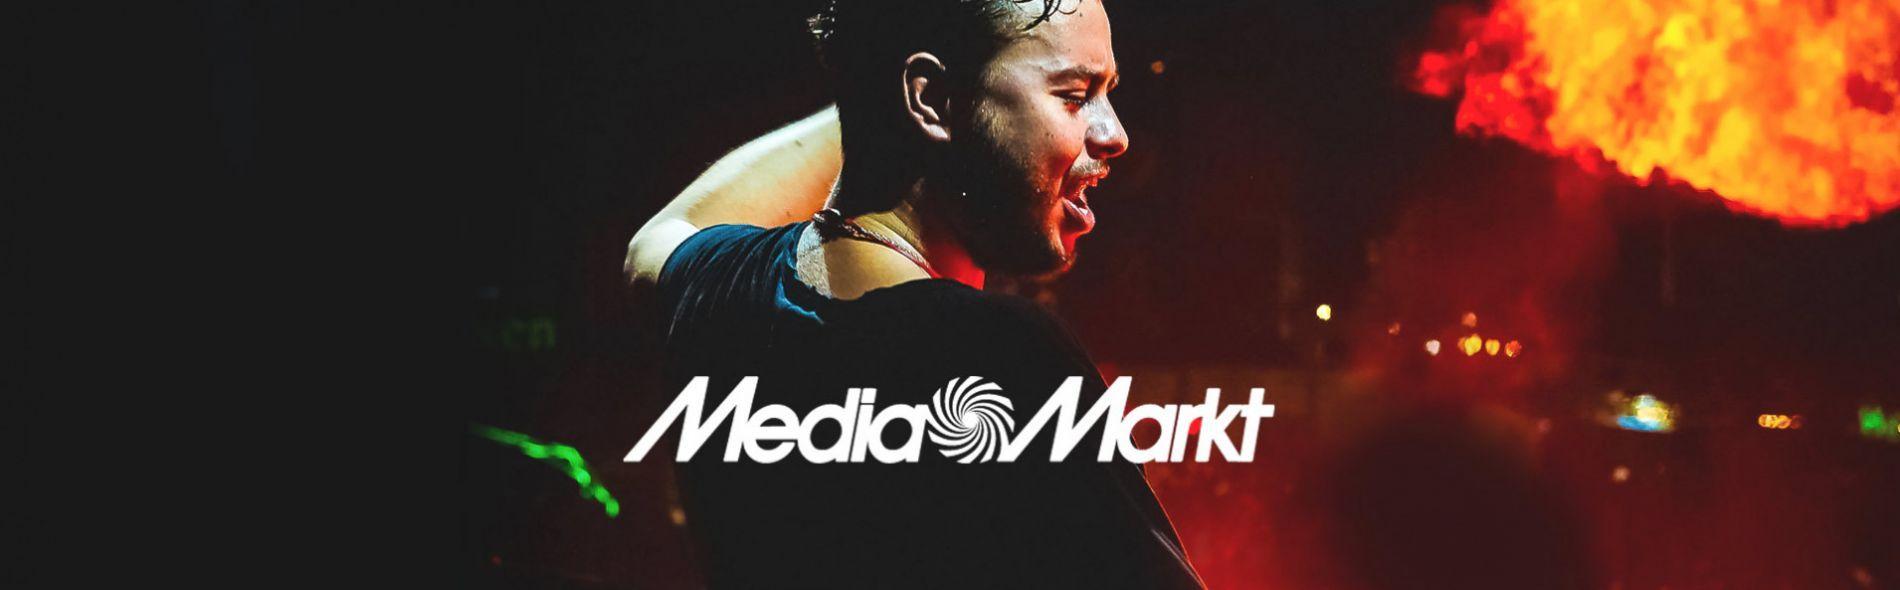 Mediamarkt & DJ Quintino